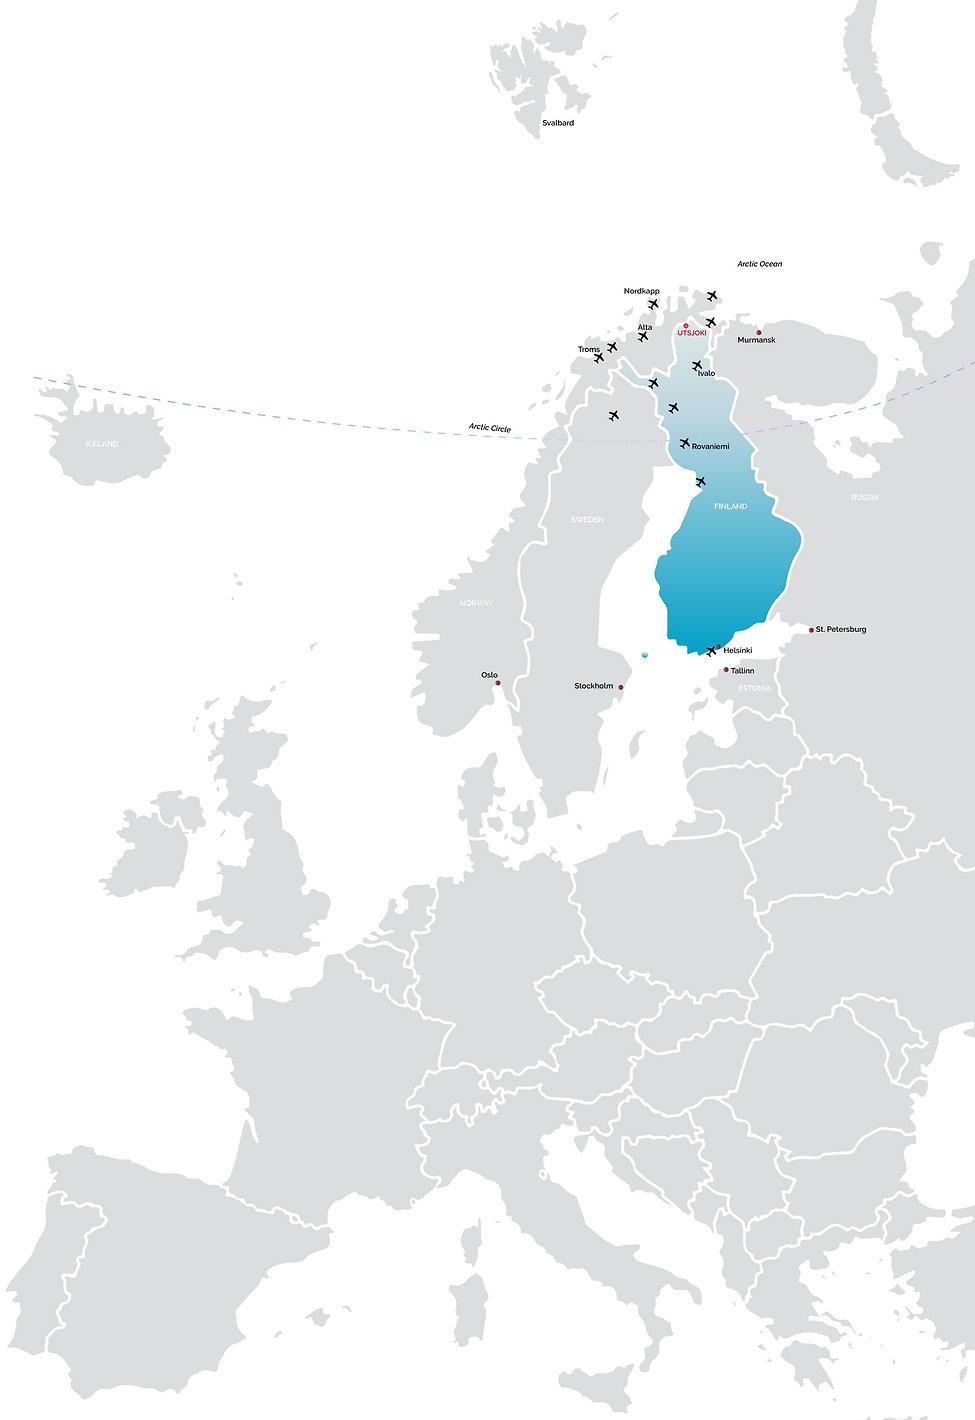 Eurooppa-iso.jpg